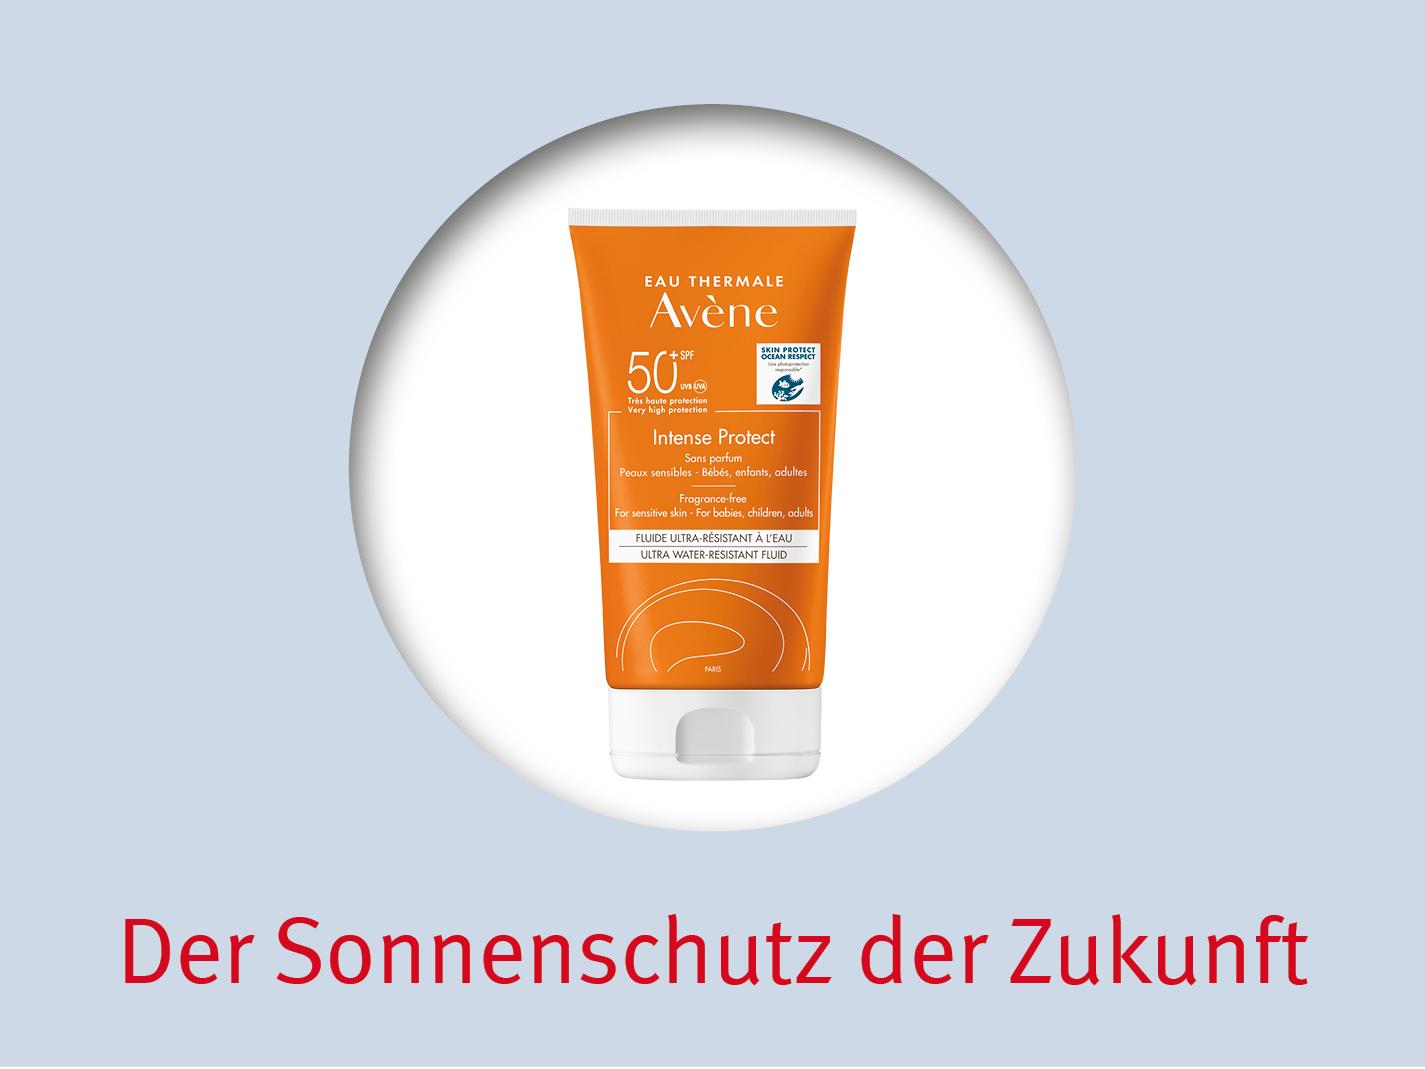 teaserbox_avene_sonnenschutz_tp_homepage.jpg